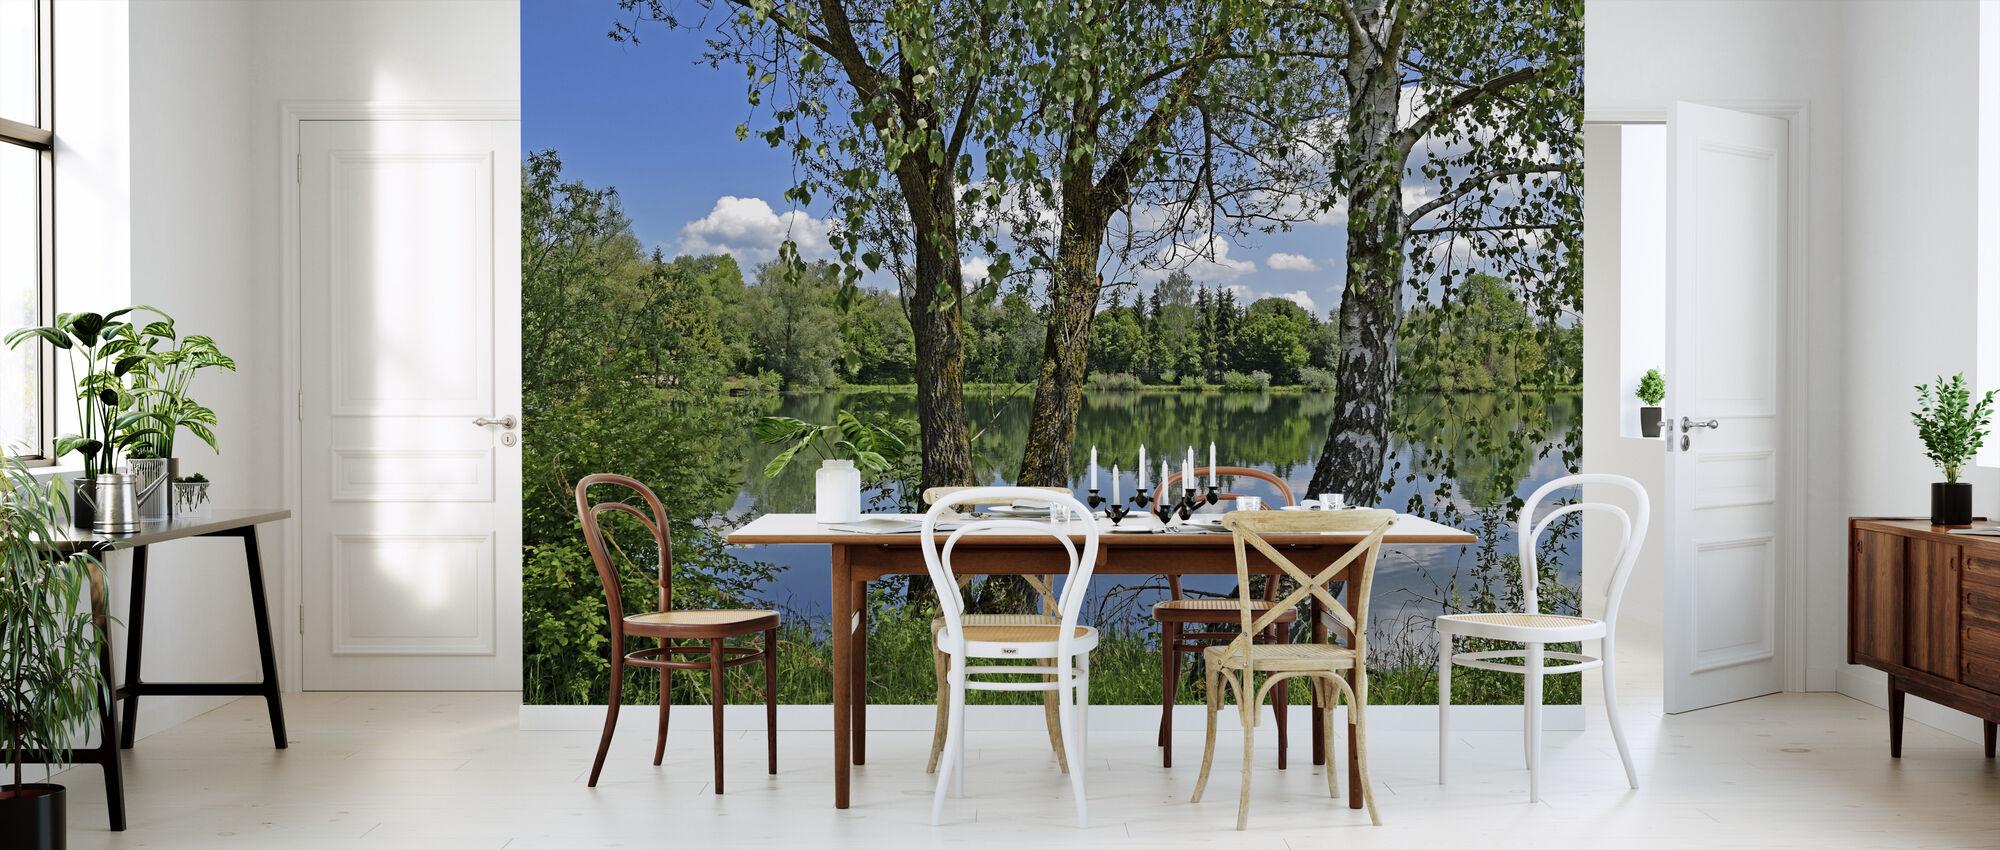 lake park fototapete nach ma photowall. Black Bedroom Furniture Sets. Home Design Ideas